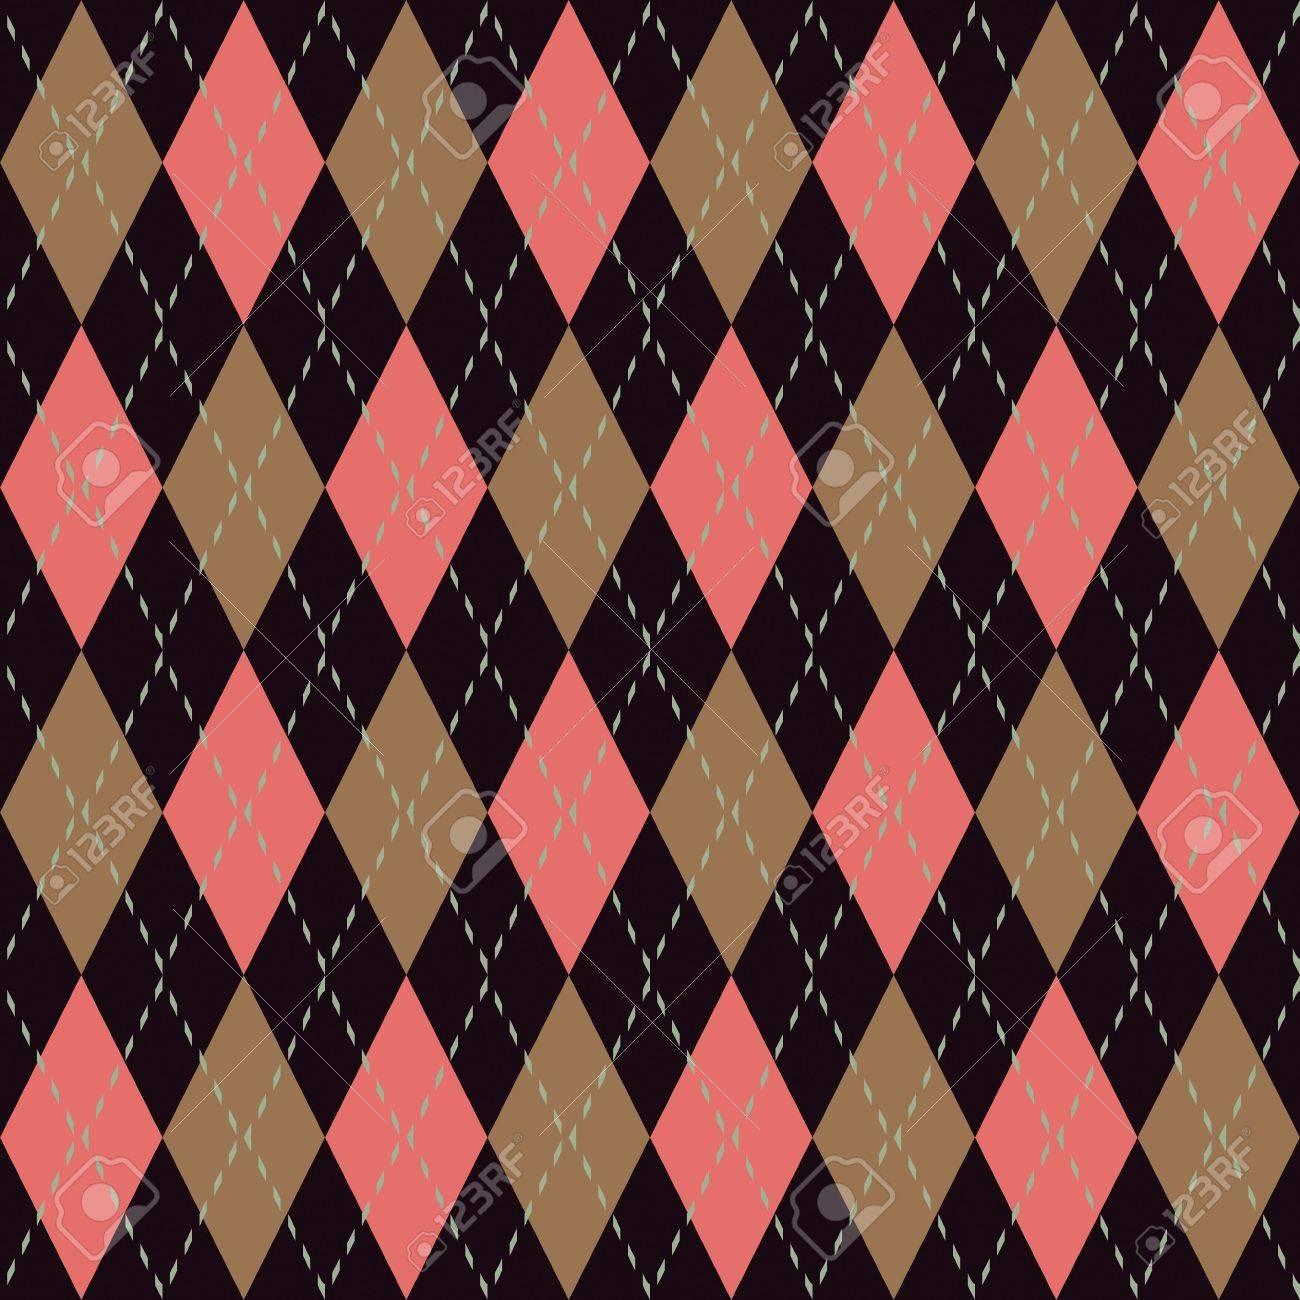 Pics photos merry christmas argyle twitter backgrounds - Seamless Argyle Sweater Background Argyle Knit Pattern Seamless Tiling Background Texture